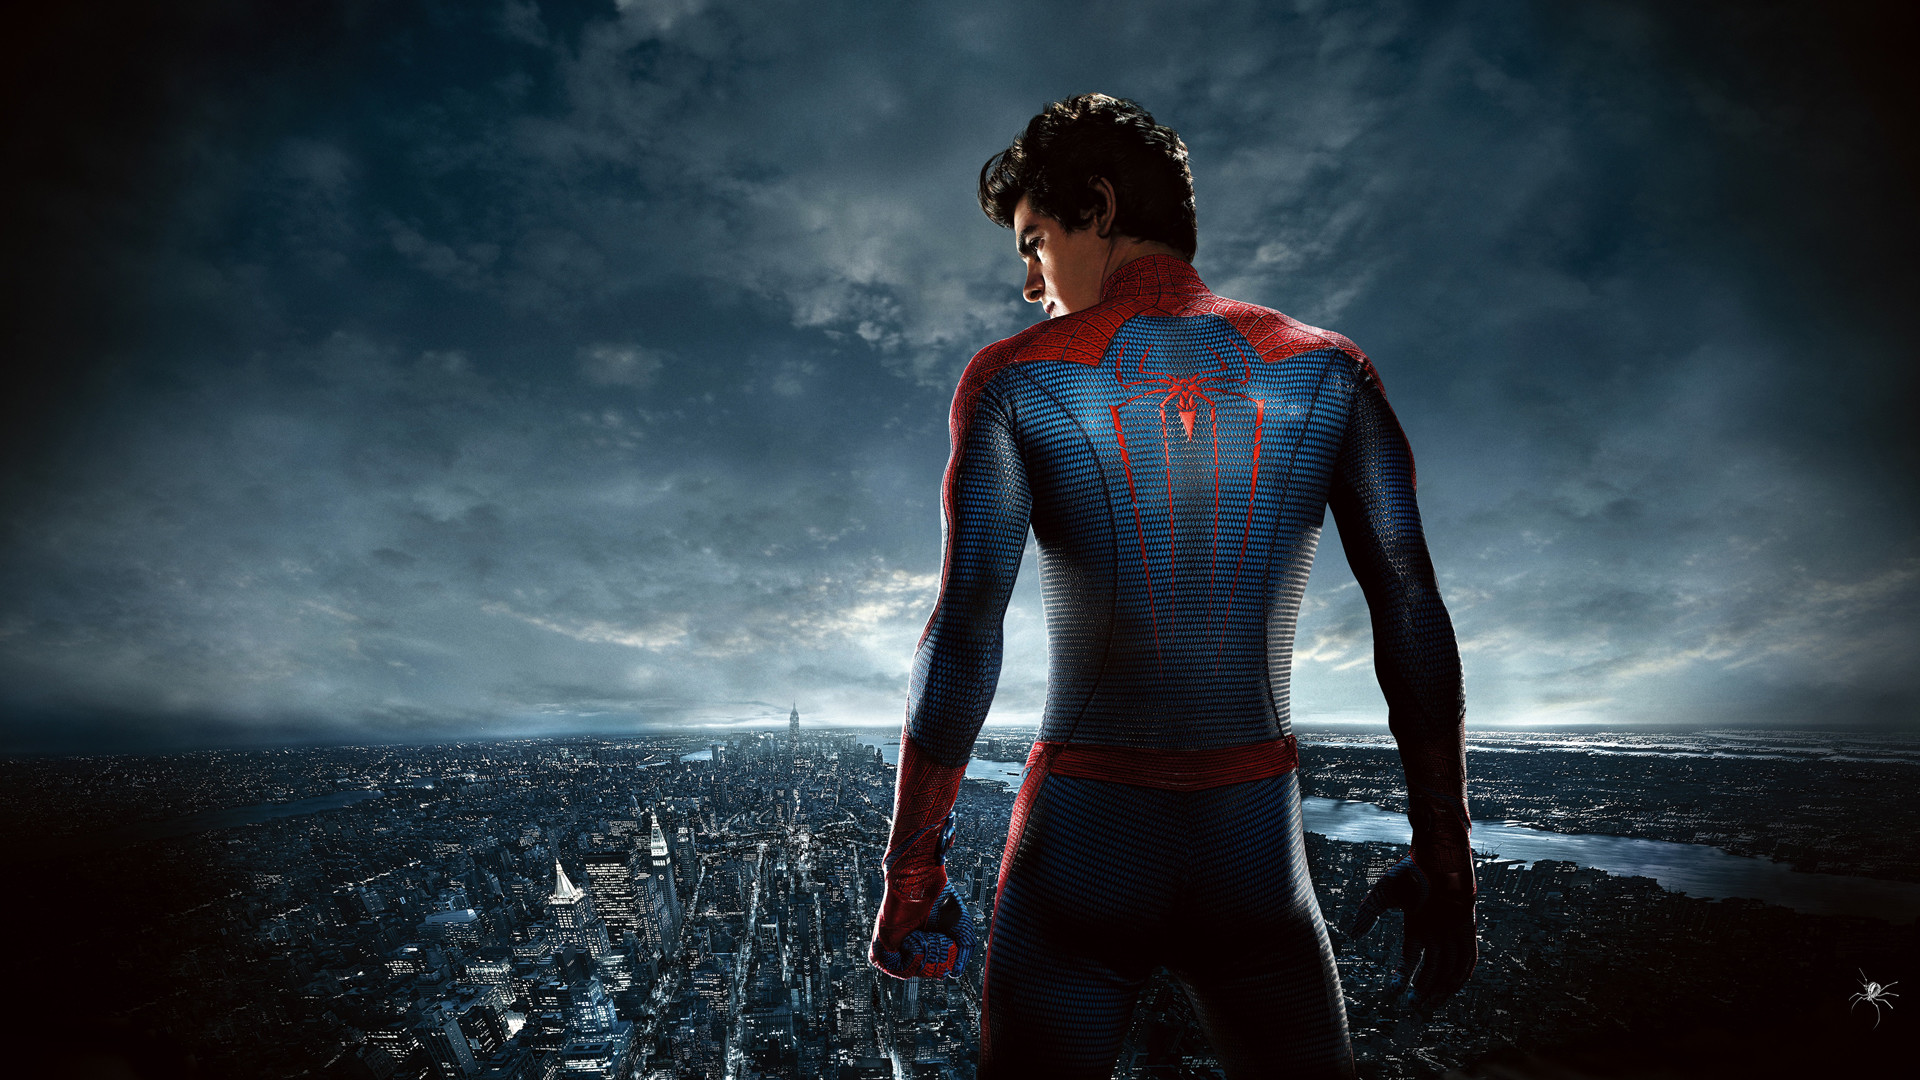 Andrew Garfield Spider-Man – Wallpaper, High Definition, High Quality .